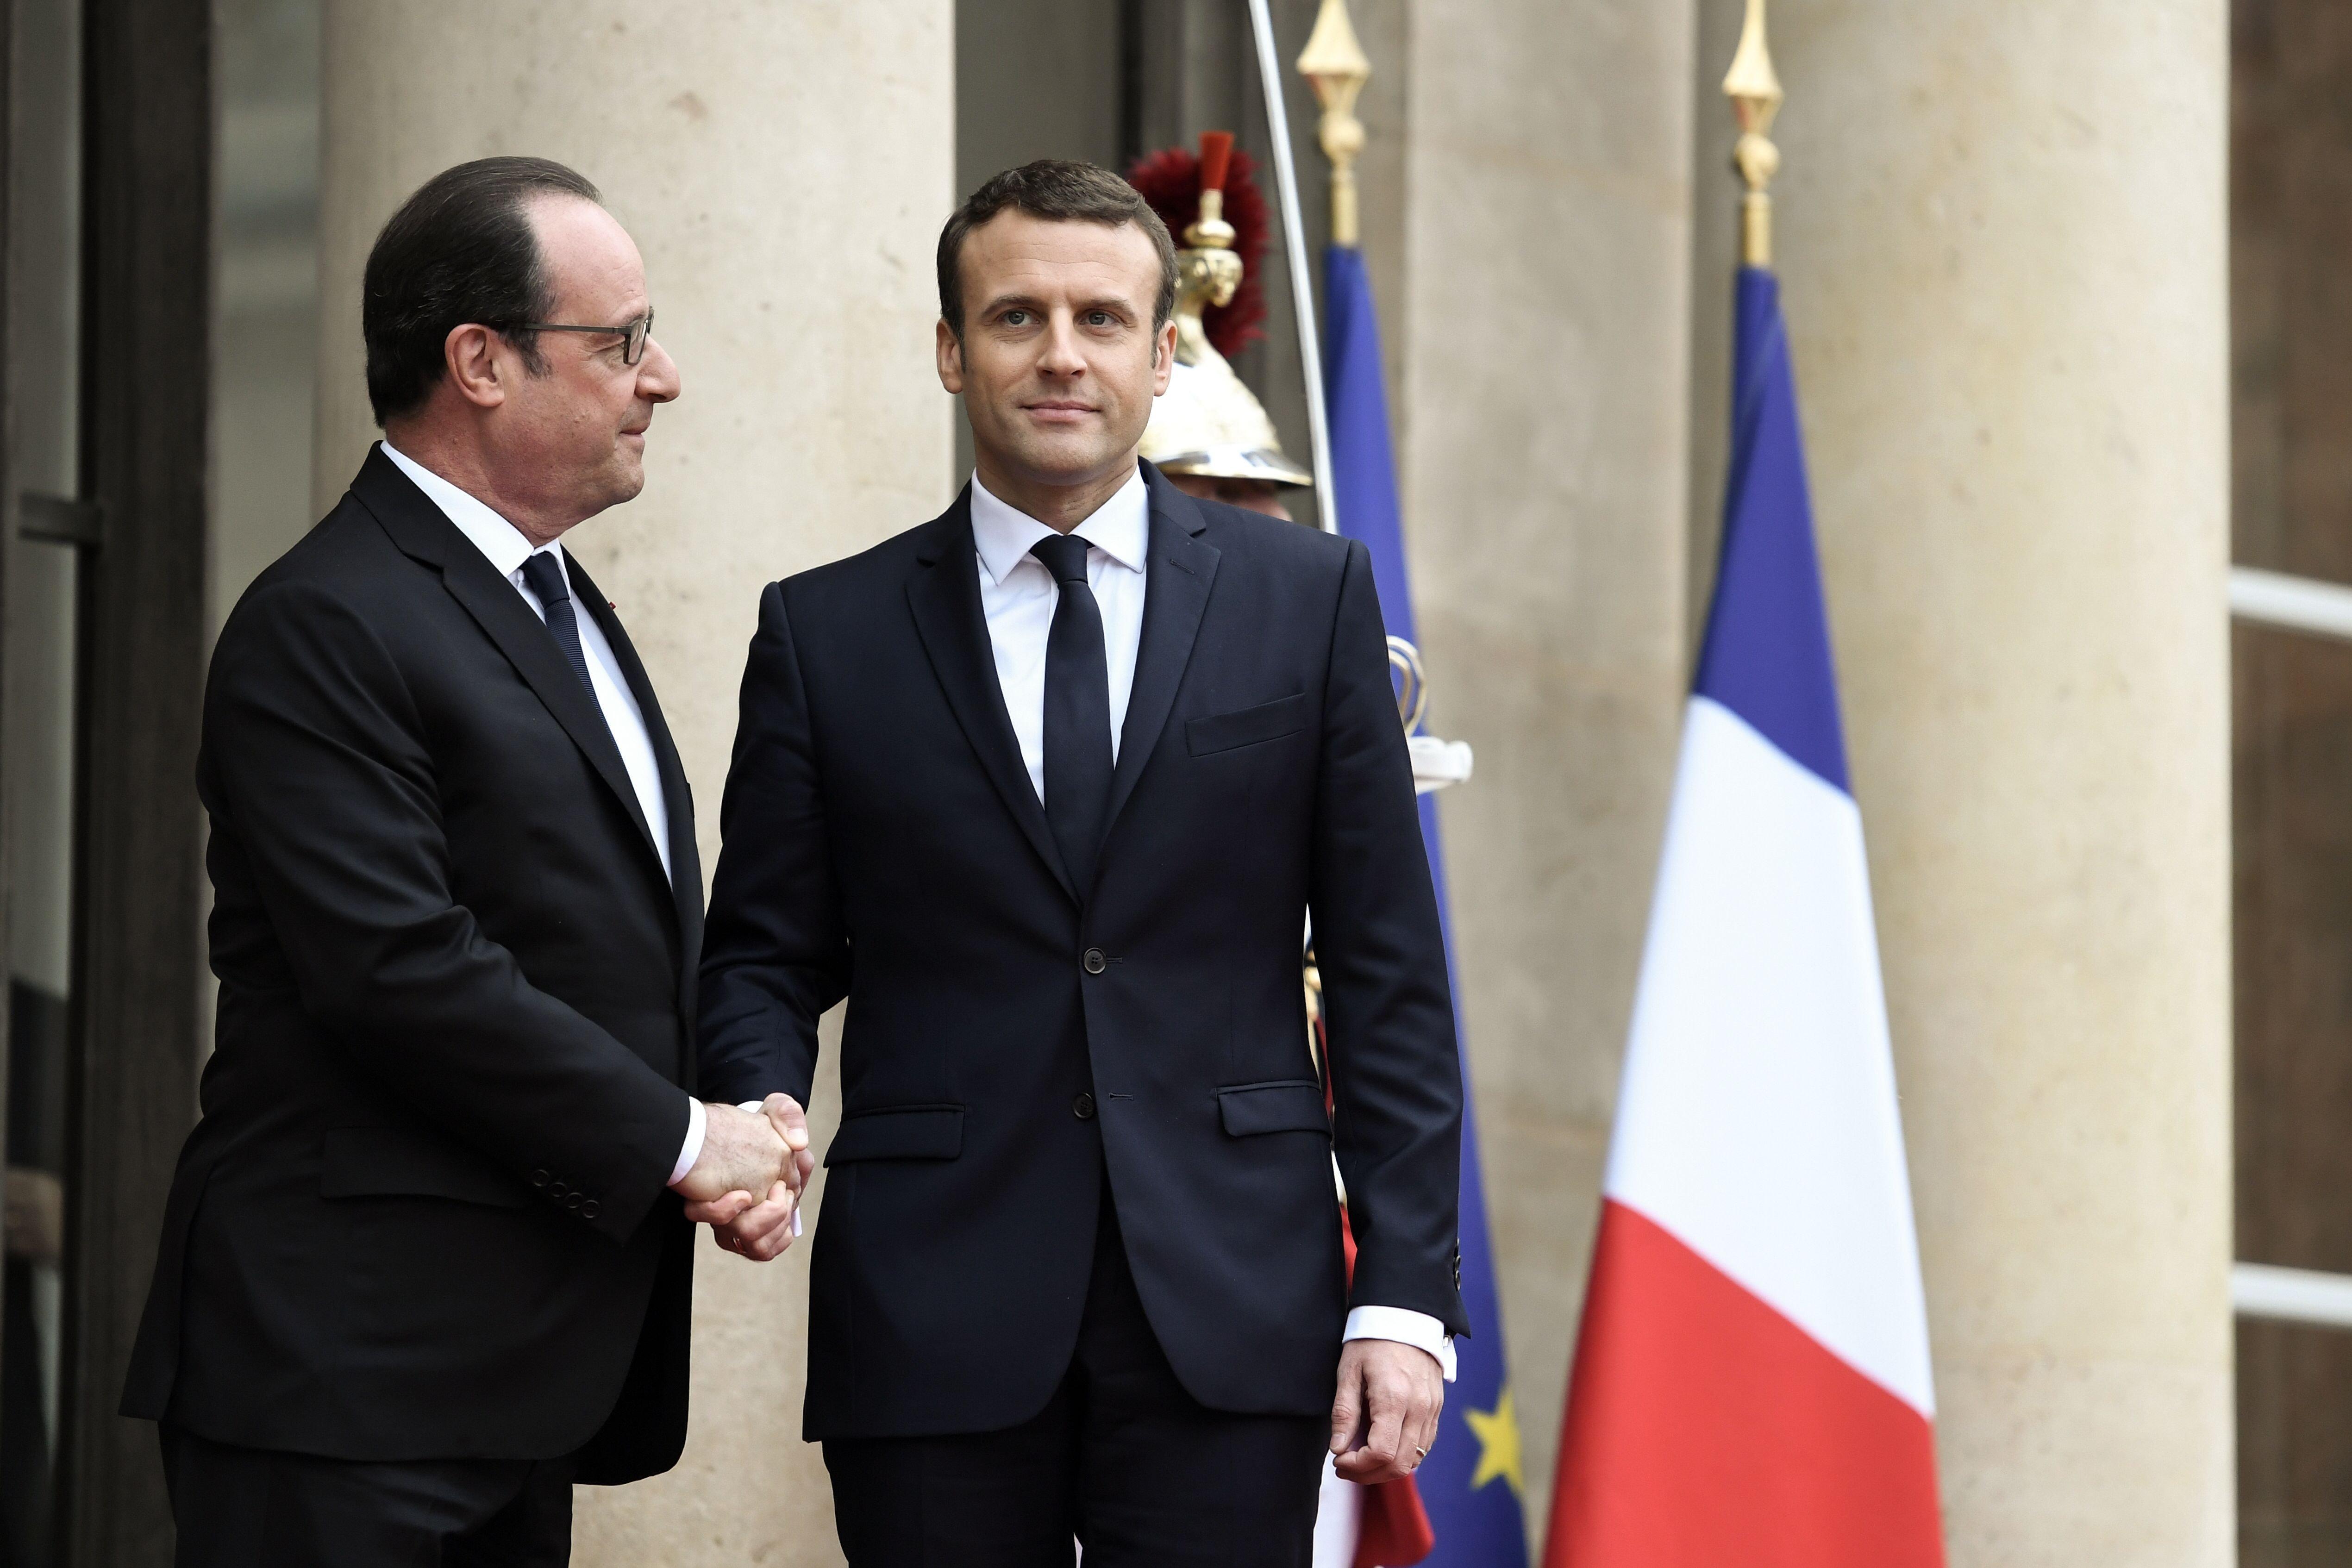 Emmanuel Macron Pledges To Unite France As He Is Sworn In As President